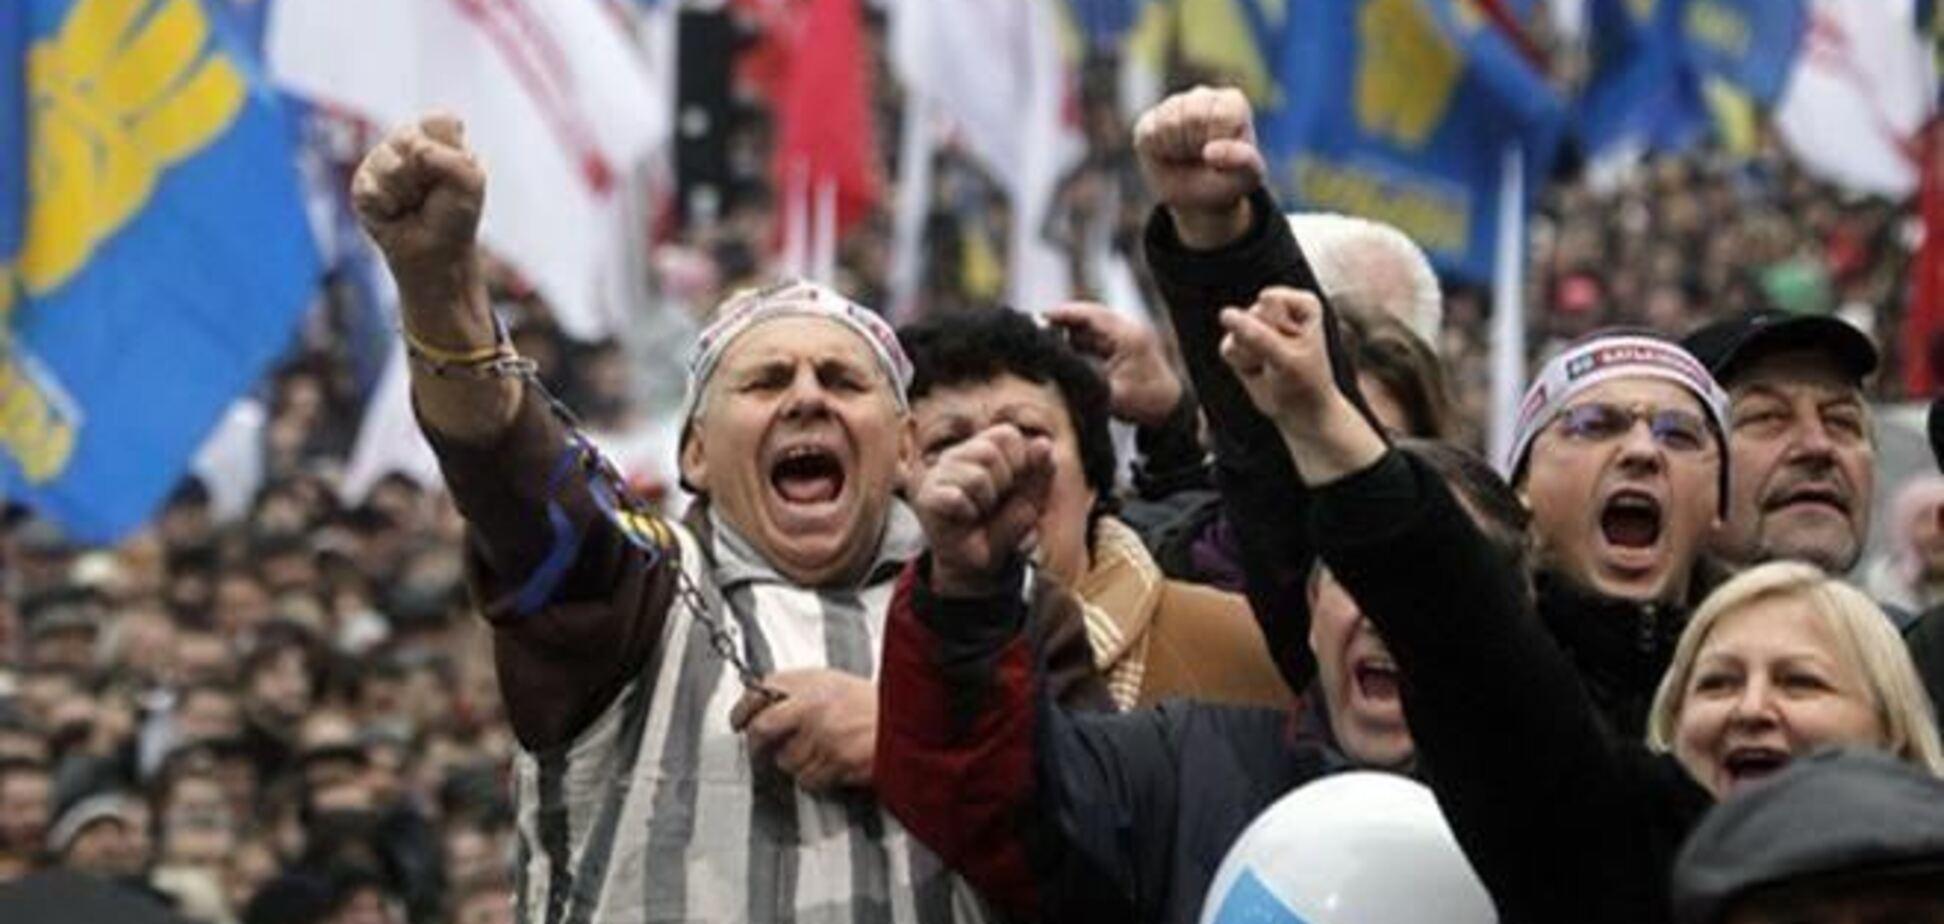 Евромайдан-2013. Хроника. 24 ноября – 10 декабря